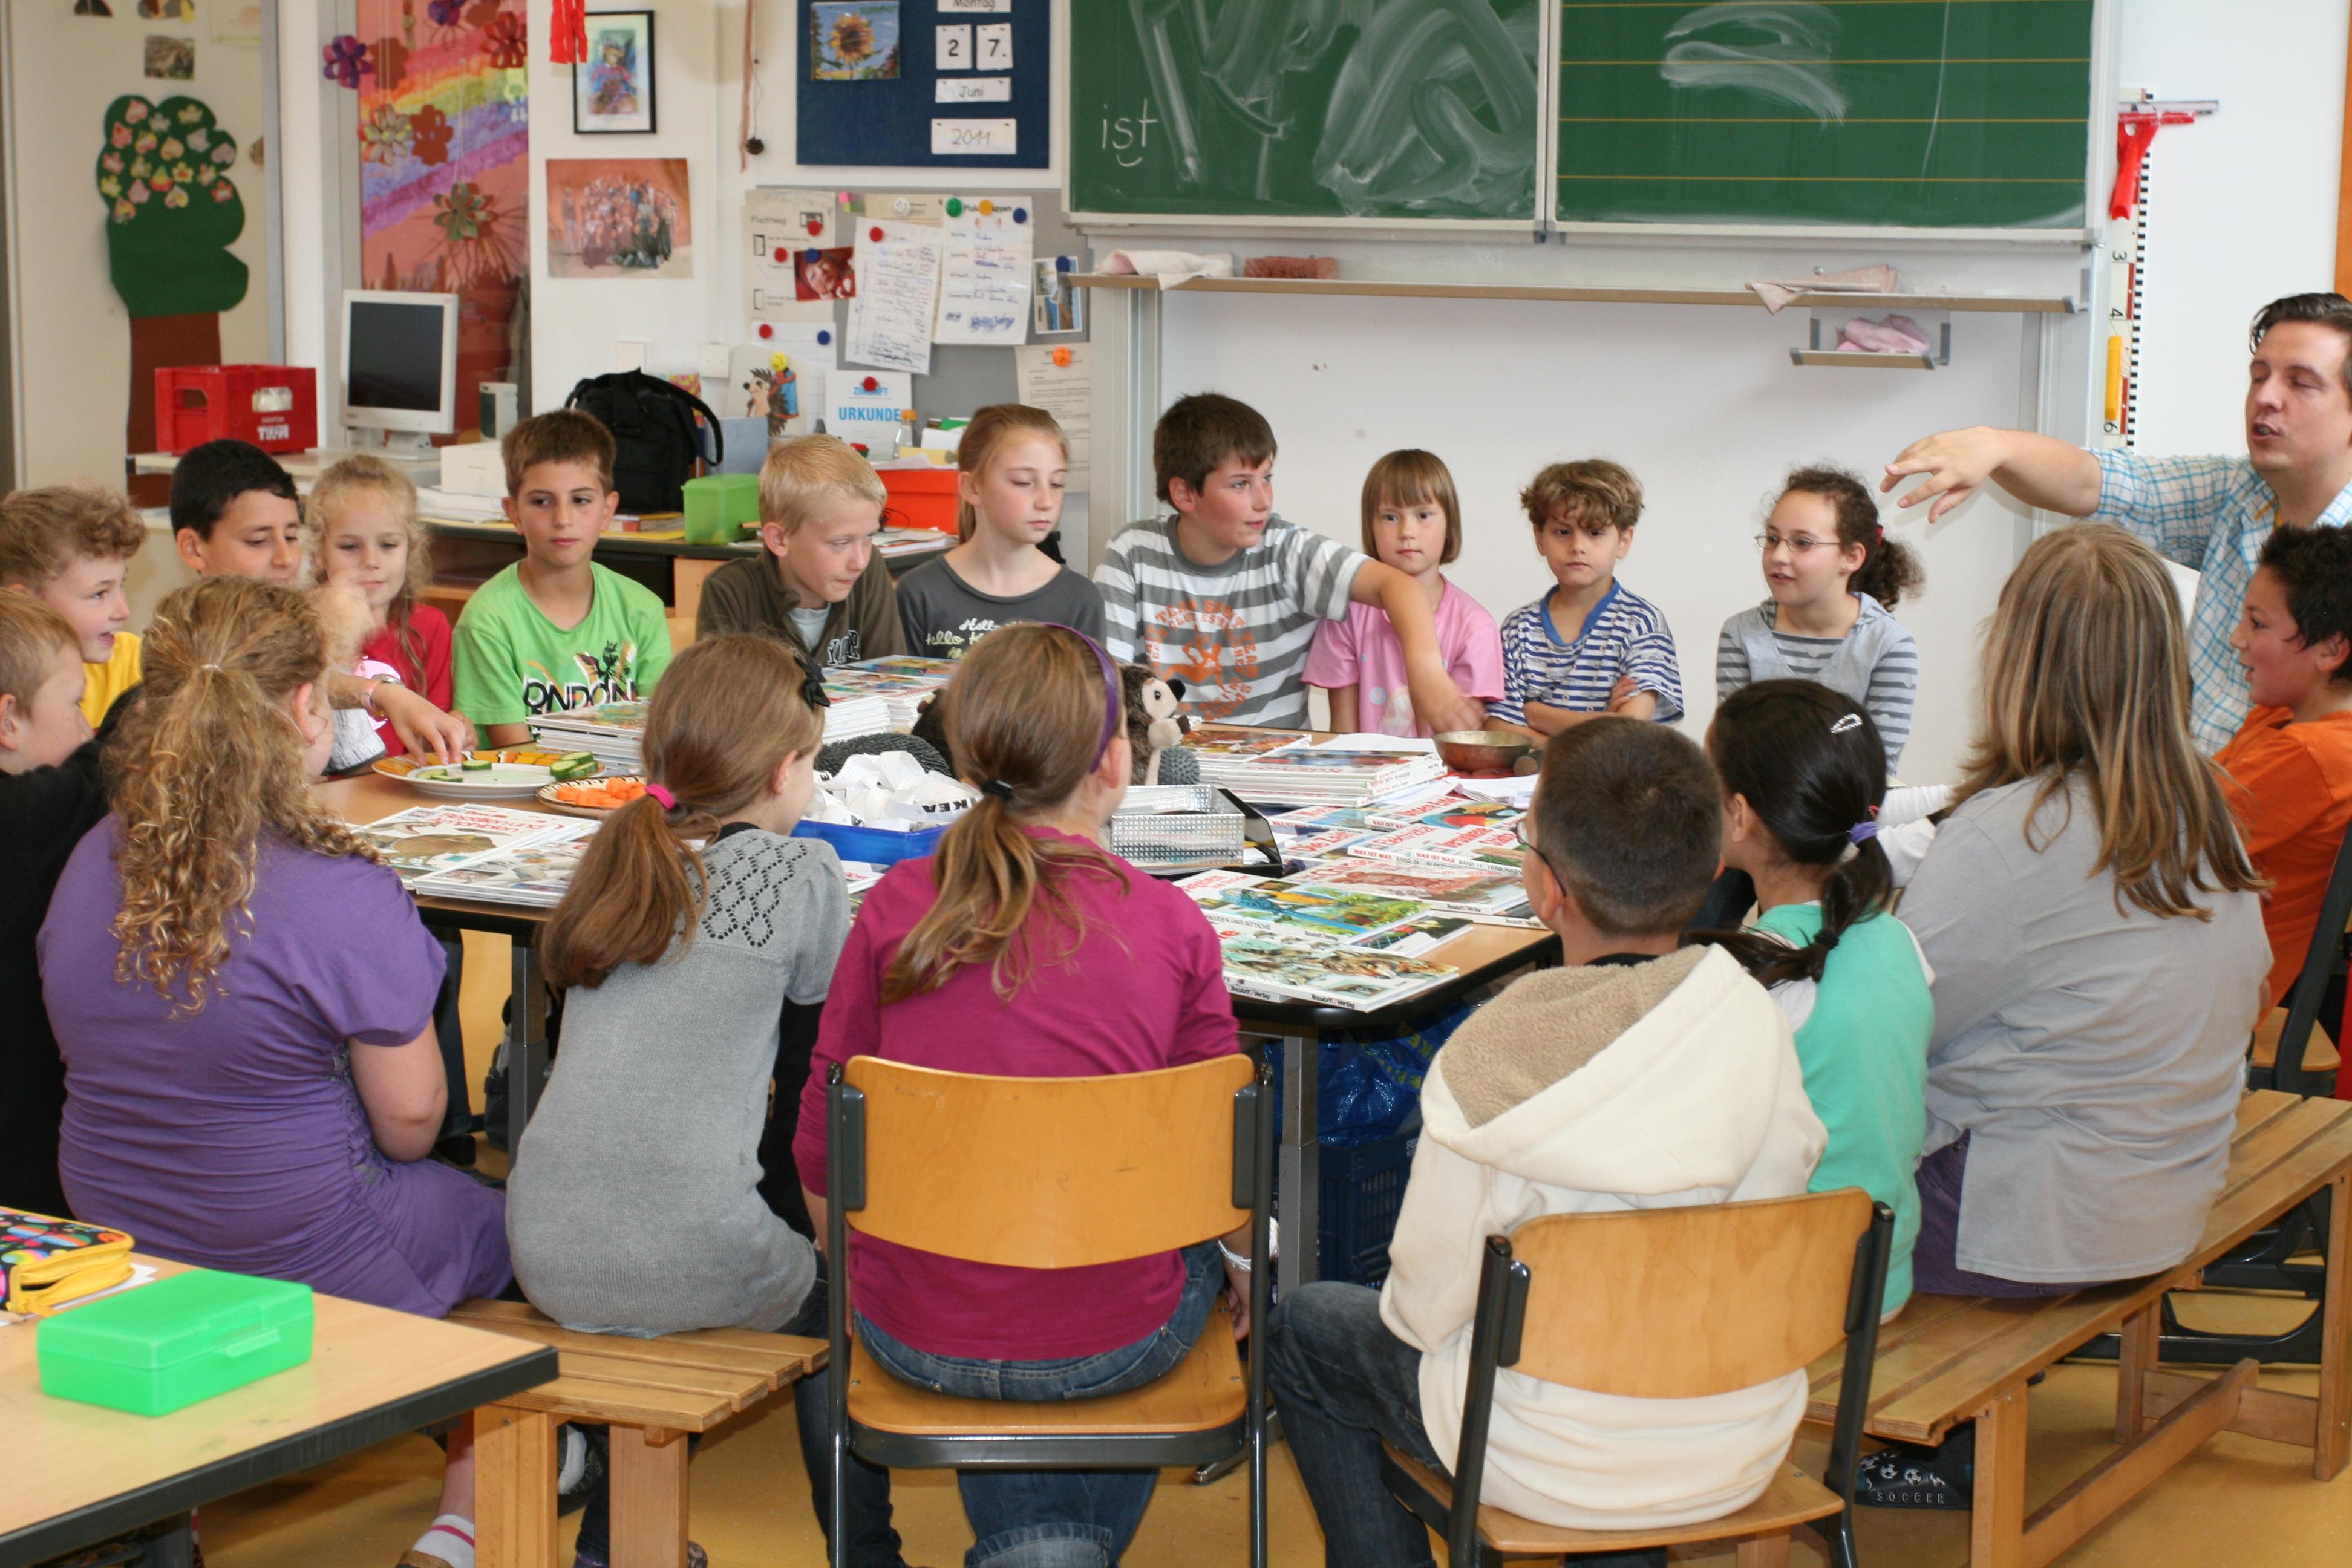 Stuhlkreis schule  Kettelerschule – Inklusive Gemeinschaftsgrundschule Bonn ...